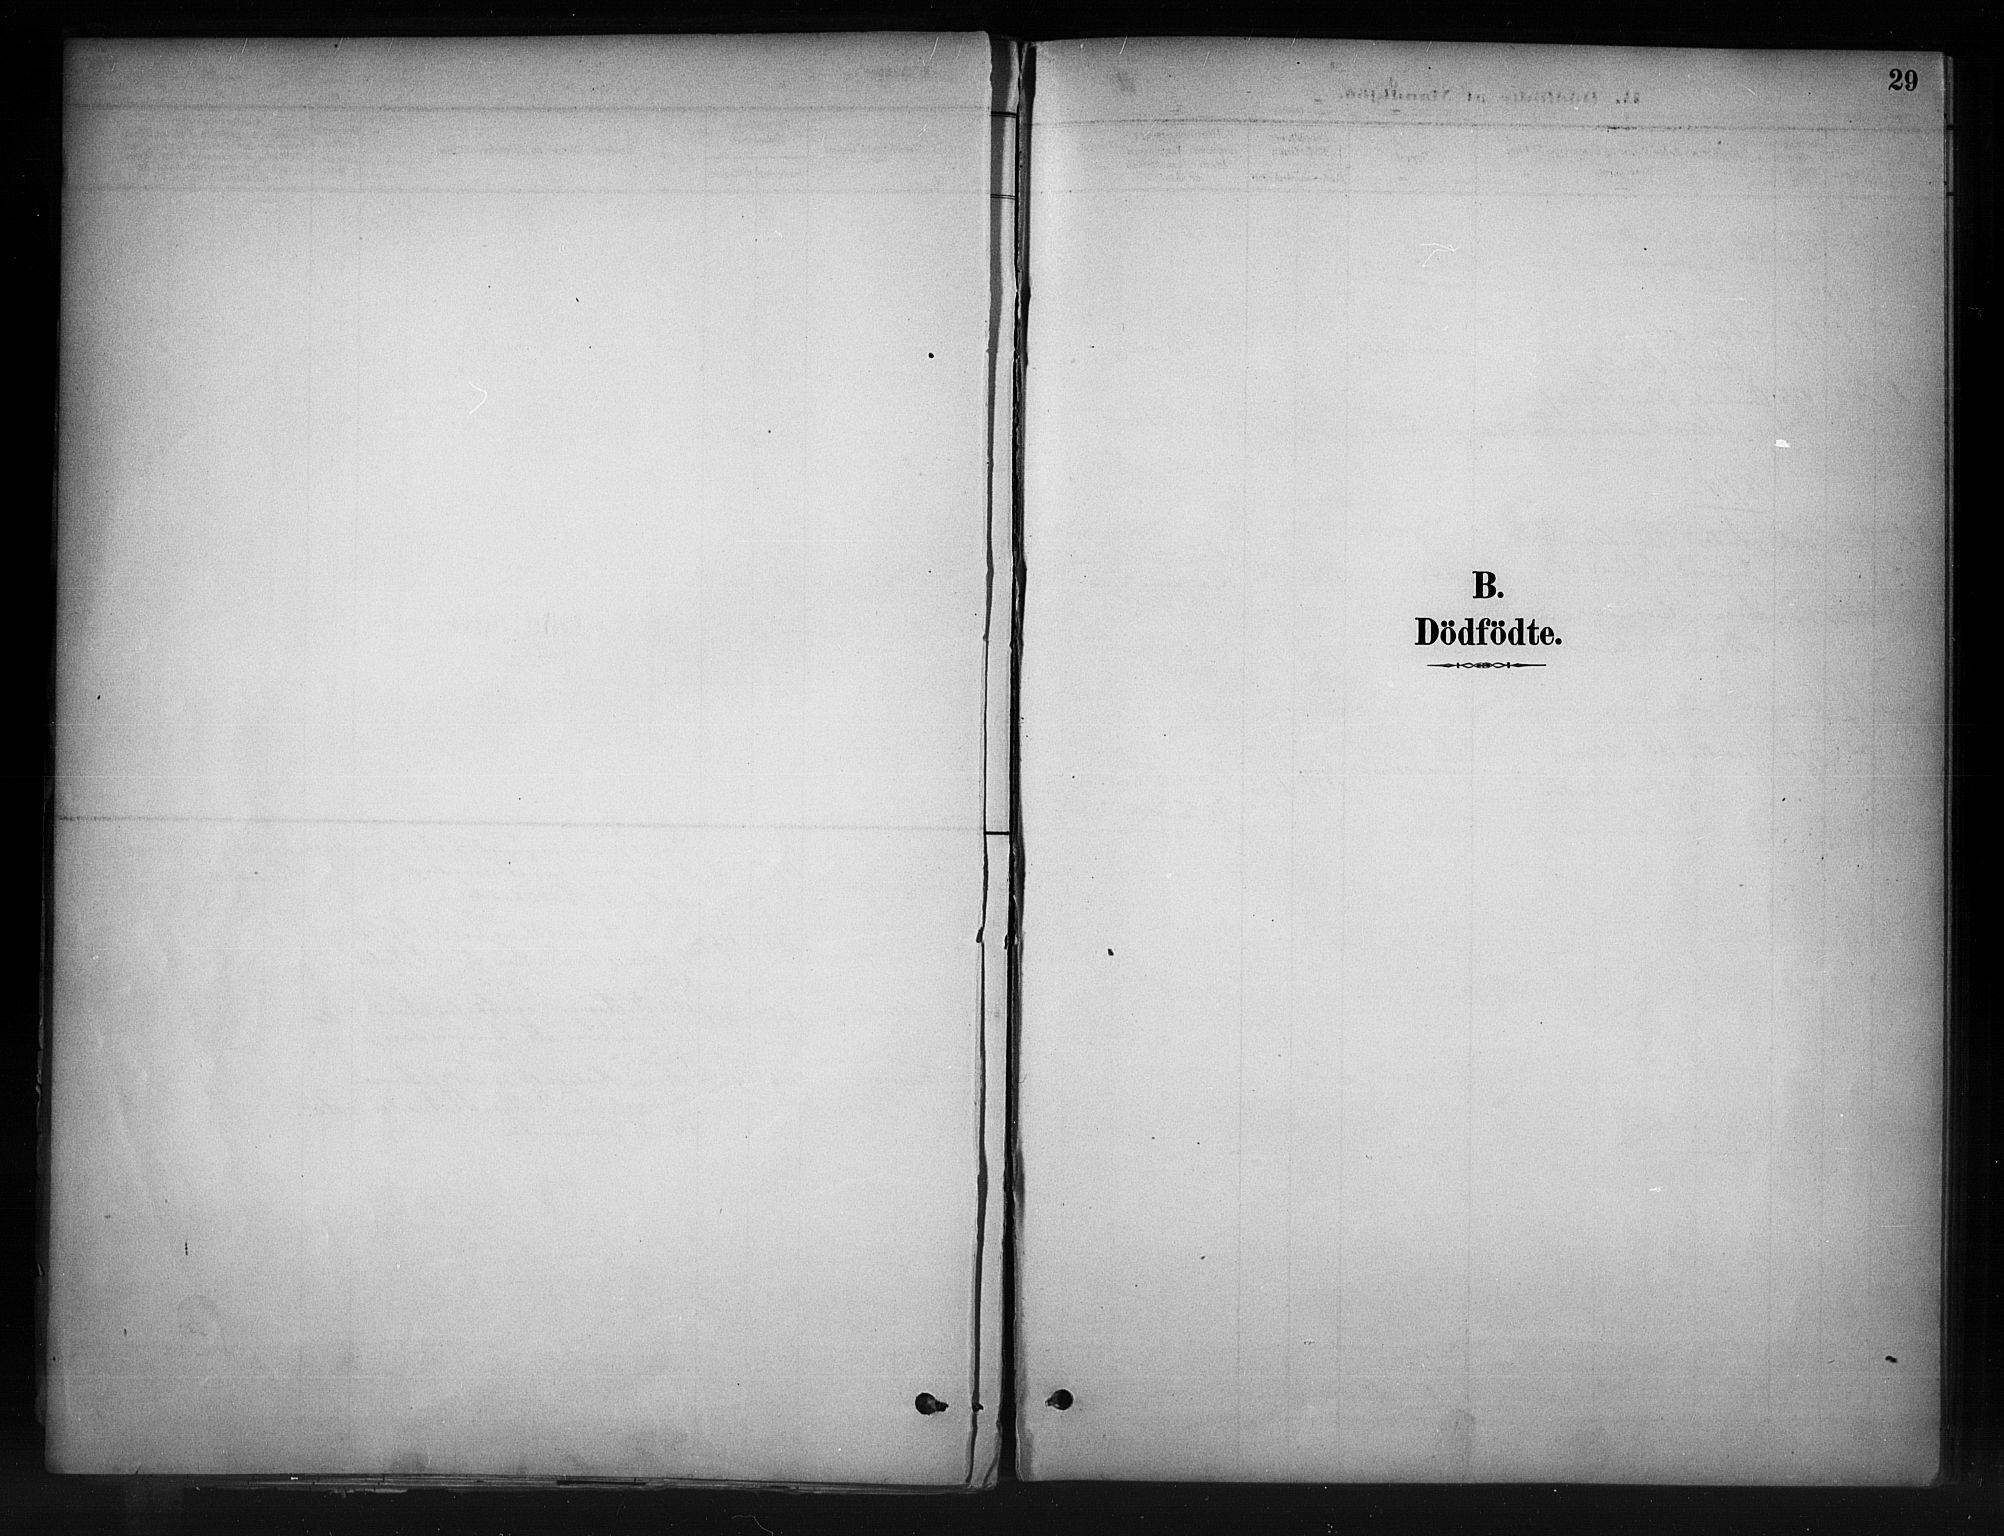 SAH, Nord-Aurdal prestekontor, Ministerialbok nr. 11, 1883-1896, s. 29